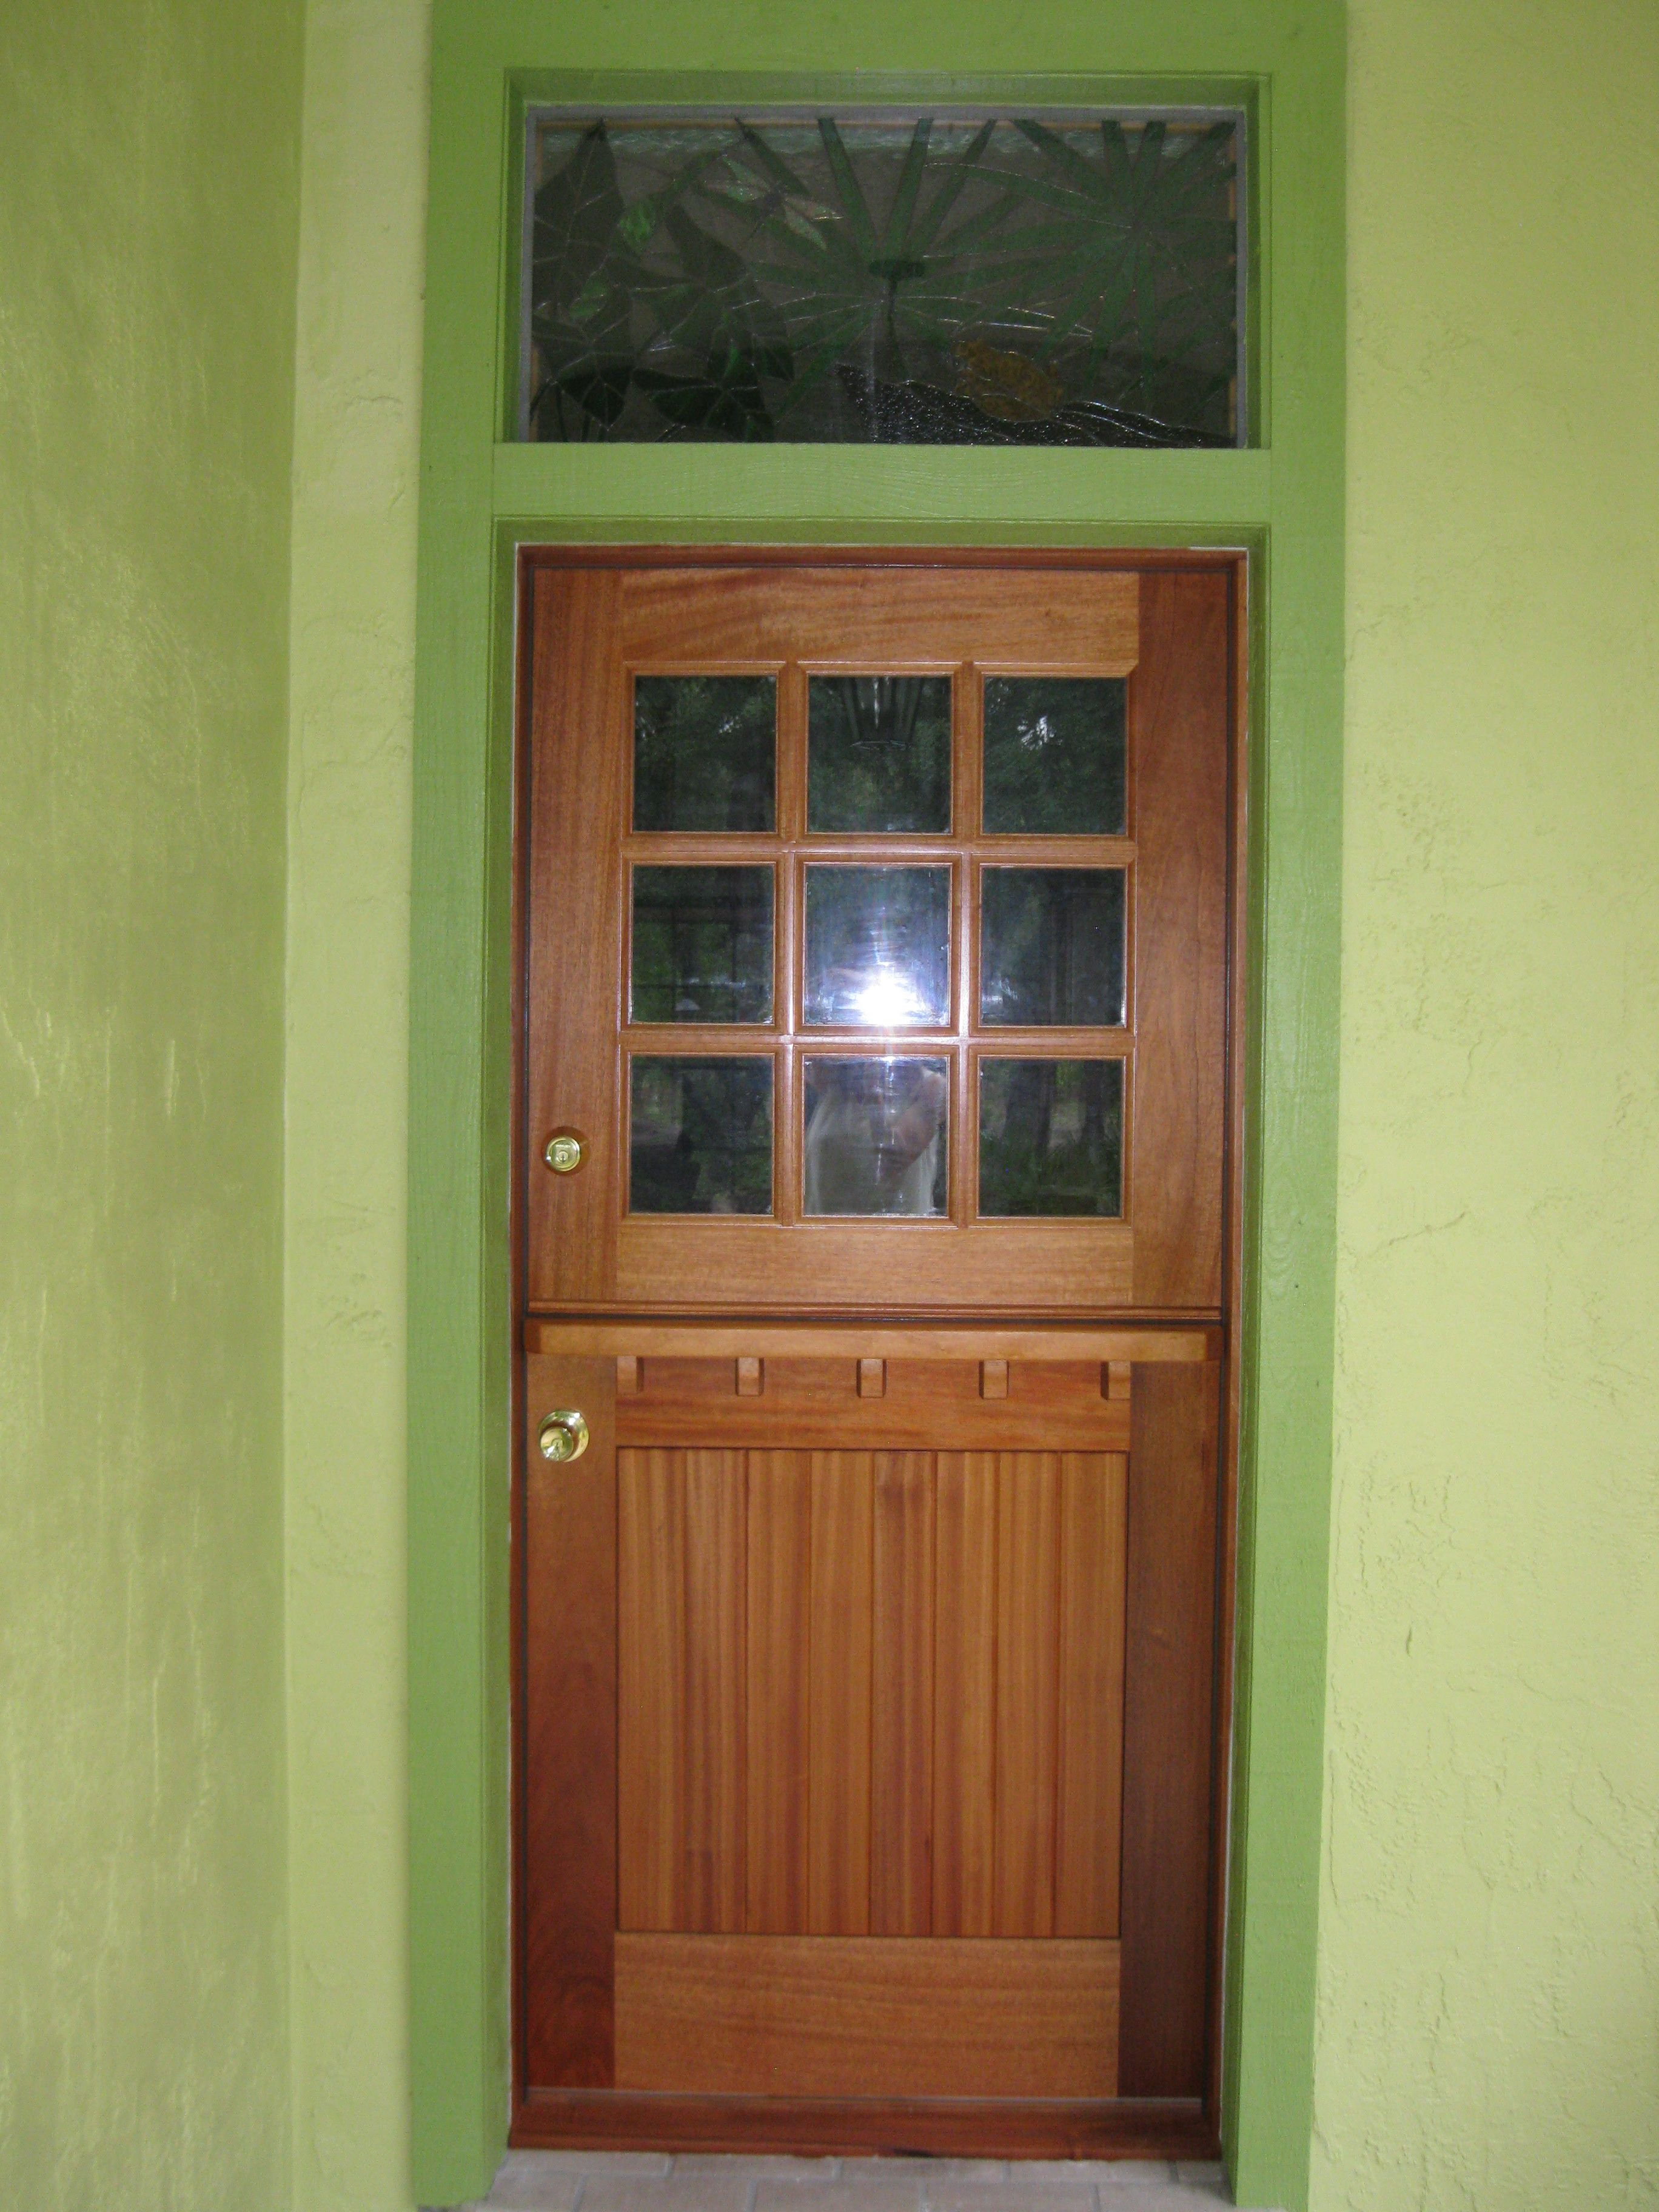 Dutch Doors L Dd230 With S3m Shelf Http Www Vintagedoors Com Dutch Html Dutch Door Interior Dutch Doors Exterior Dutch Door